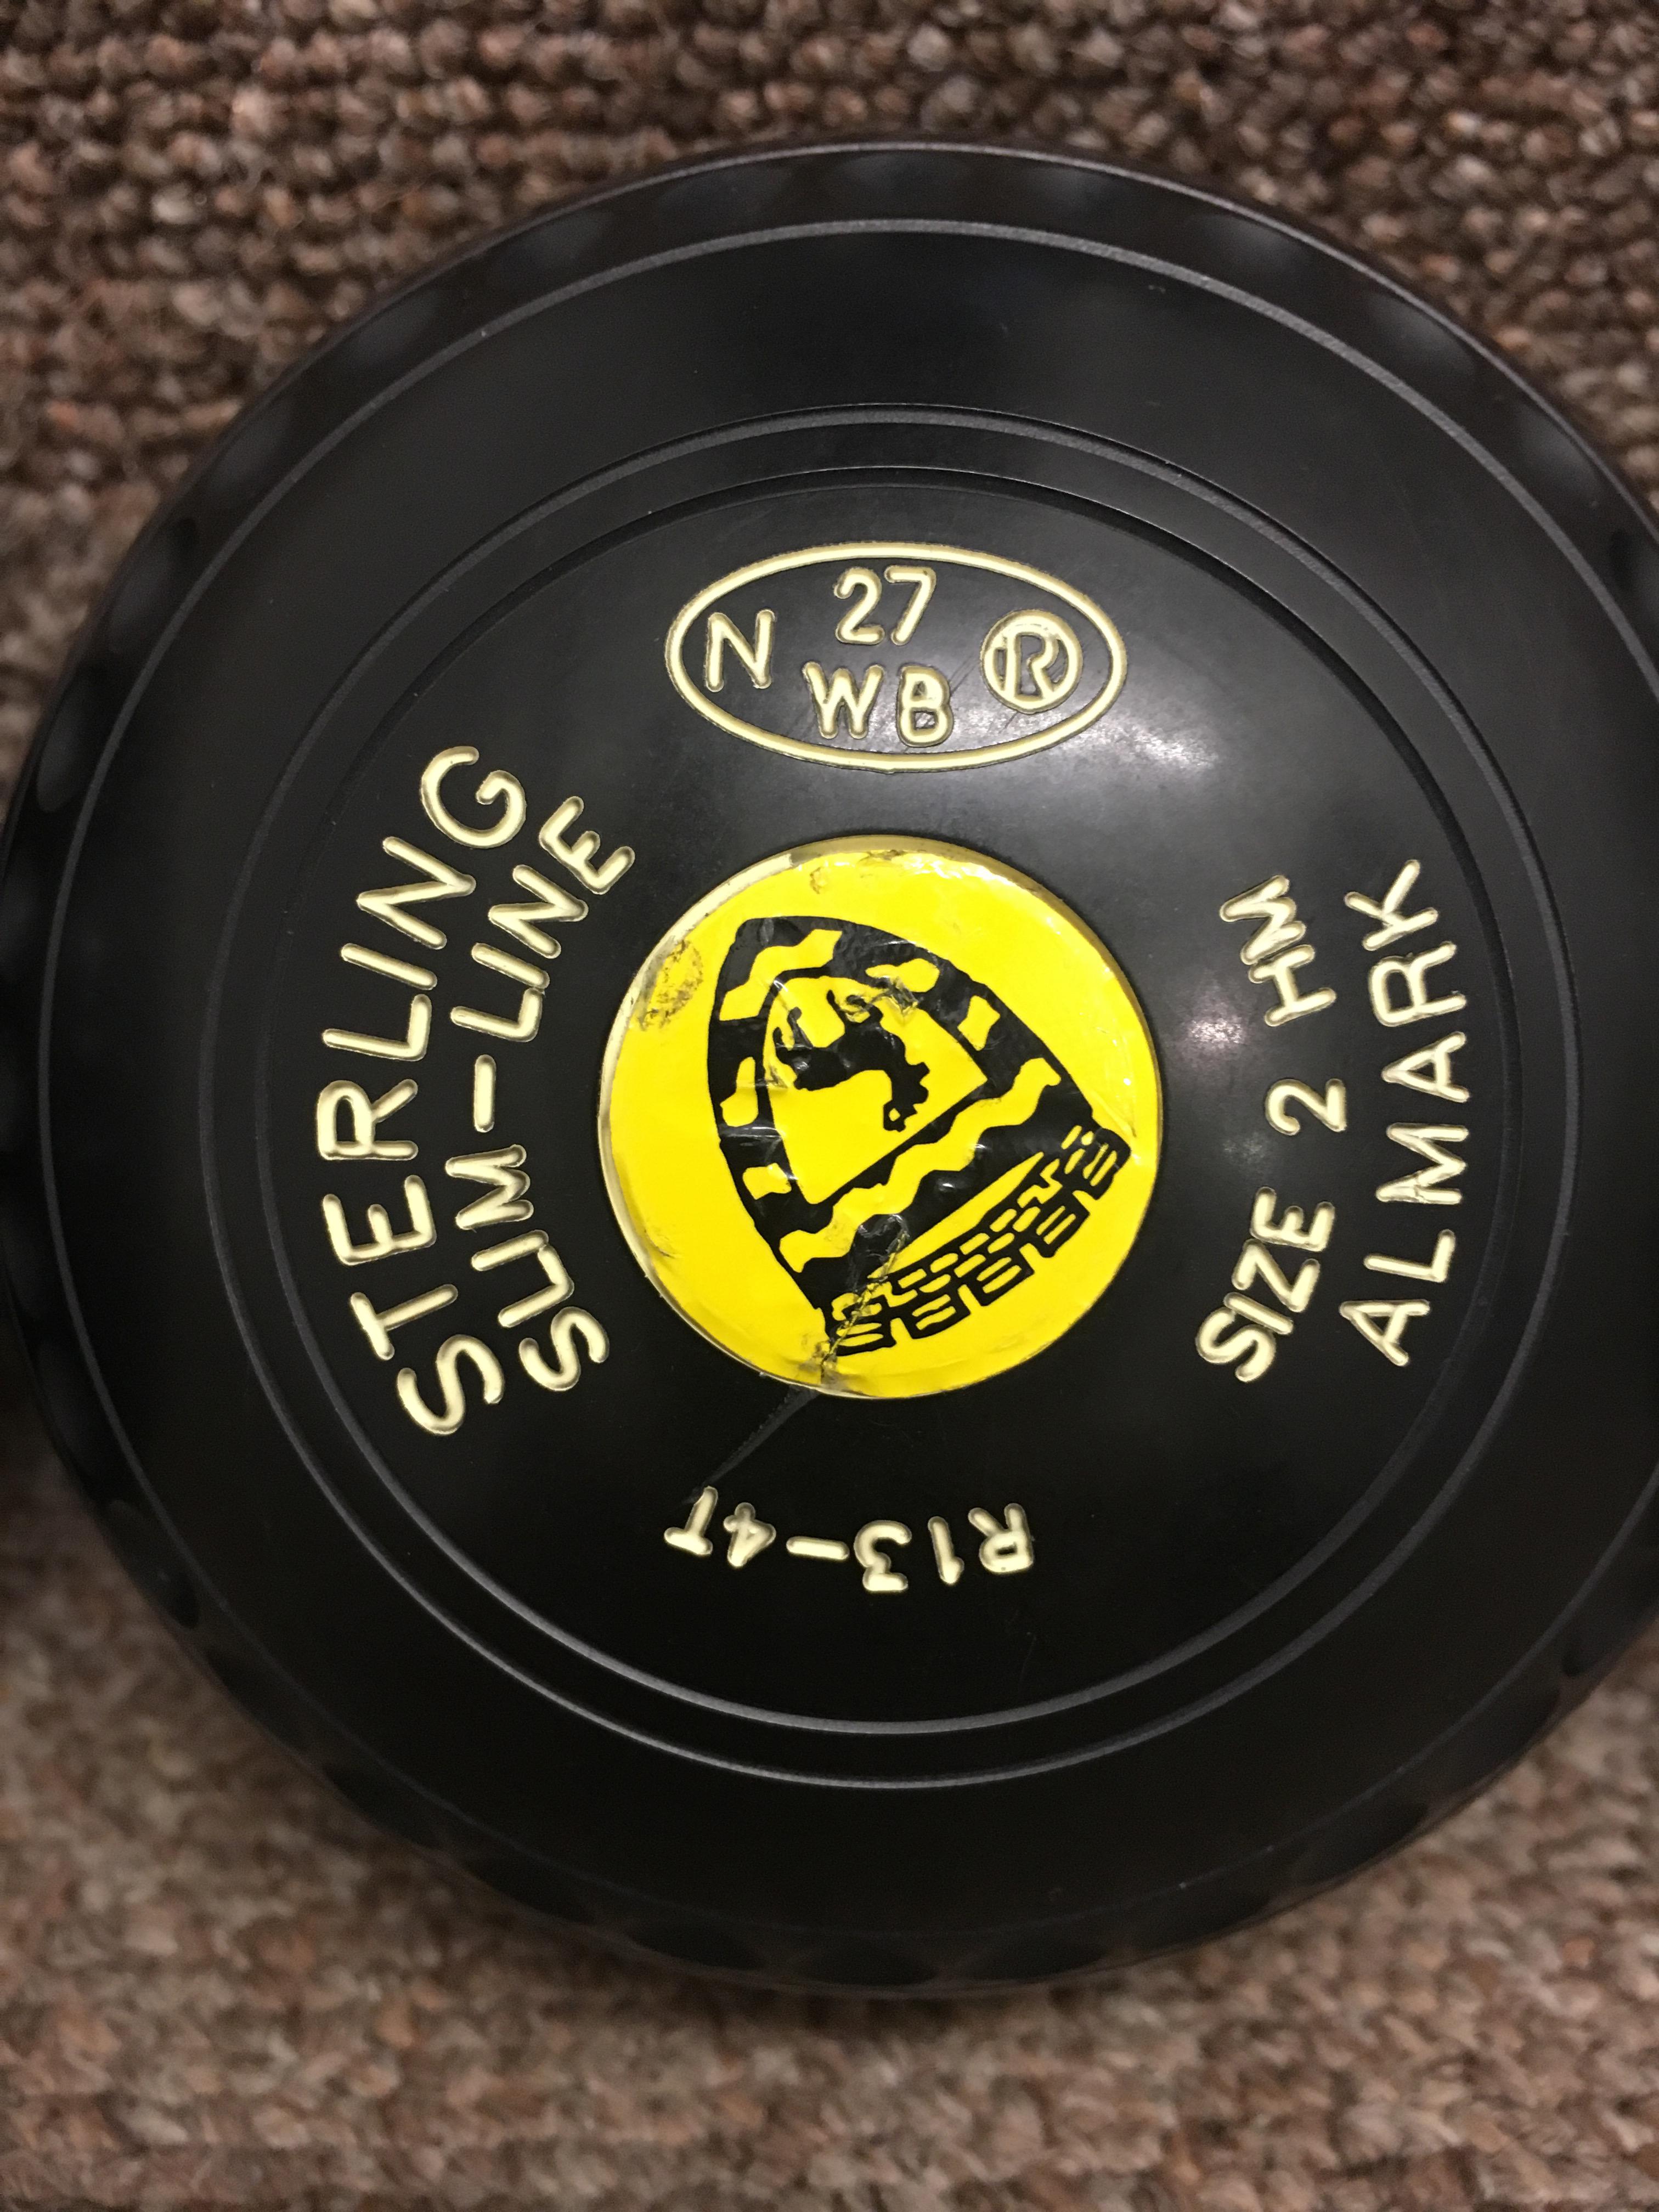 (2H) Almark Slimline 2H Black 27 Stamp